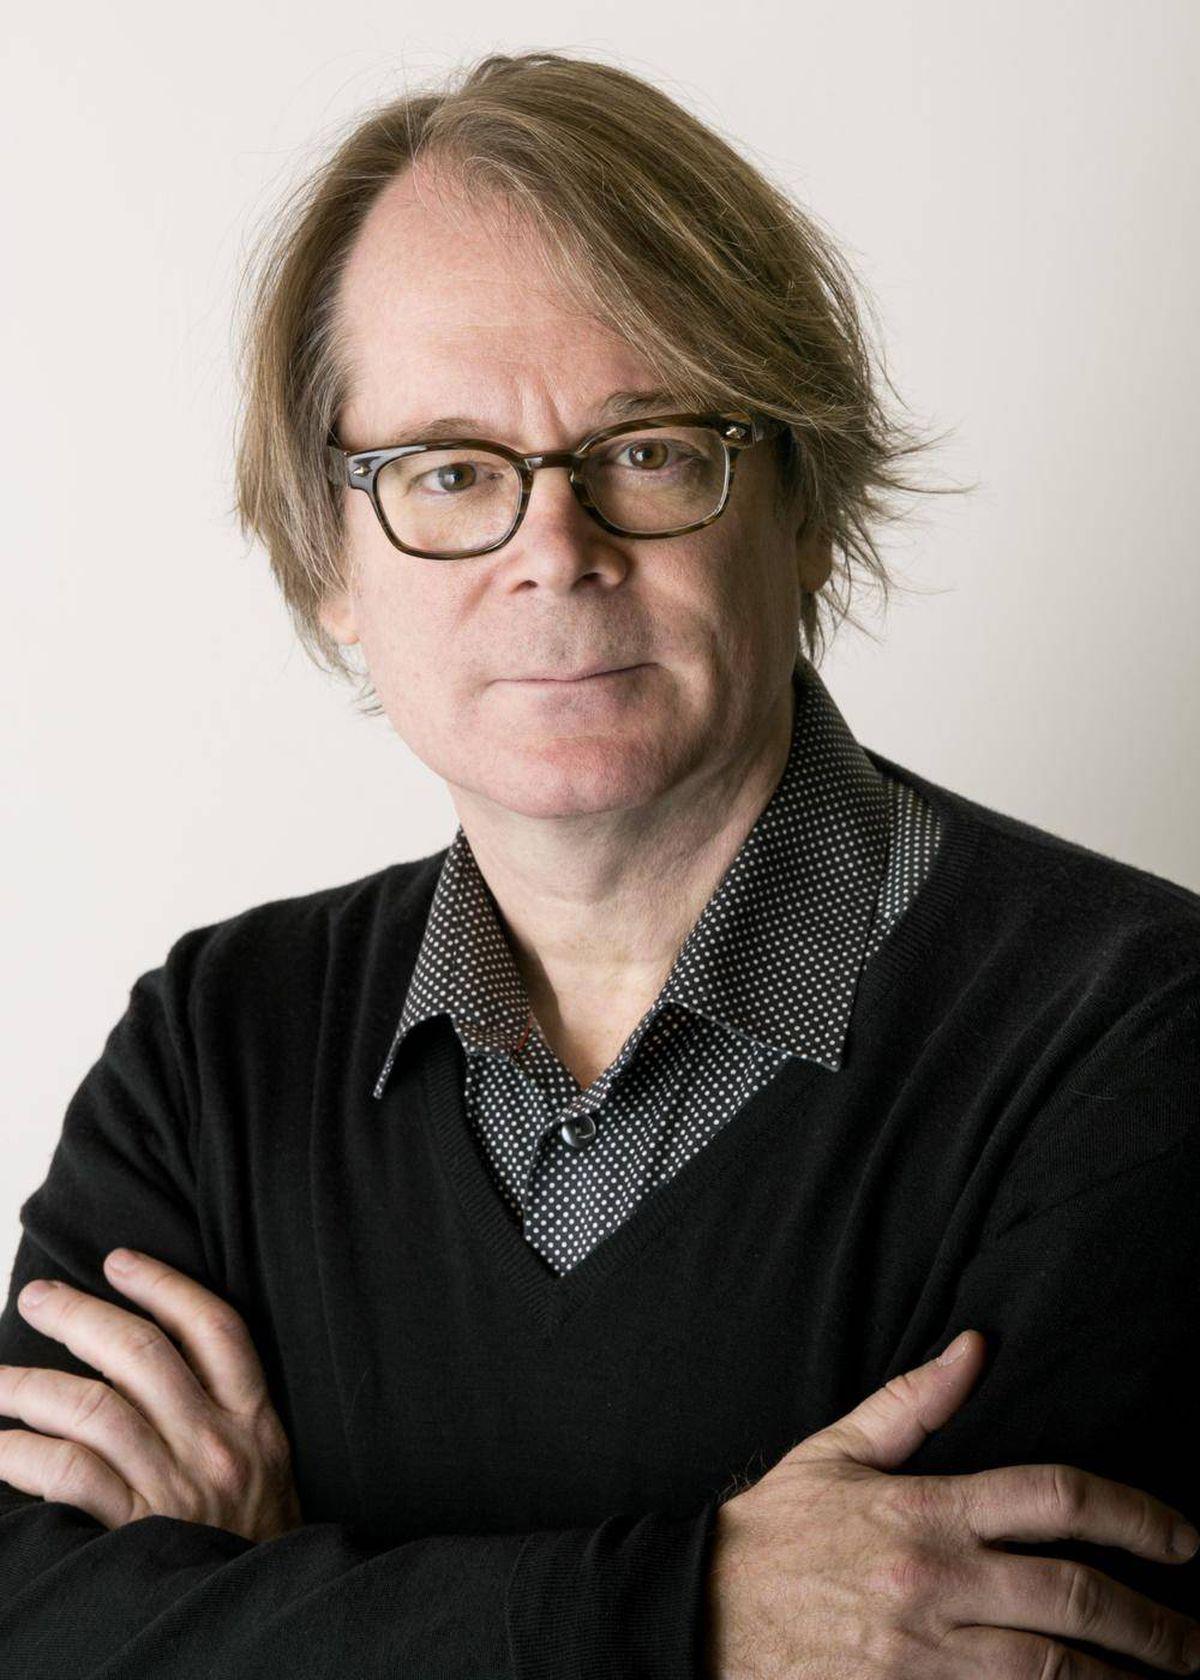 Robert Etcheverry